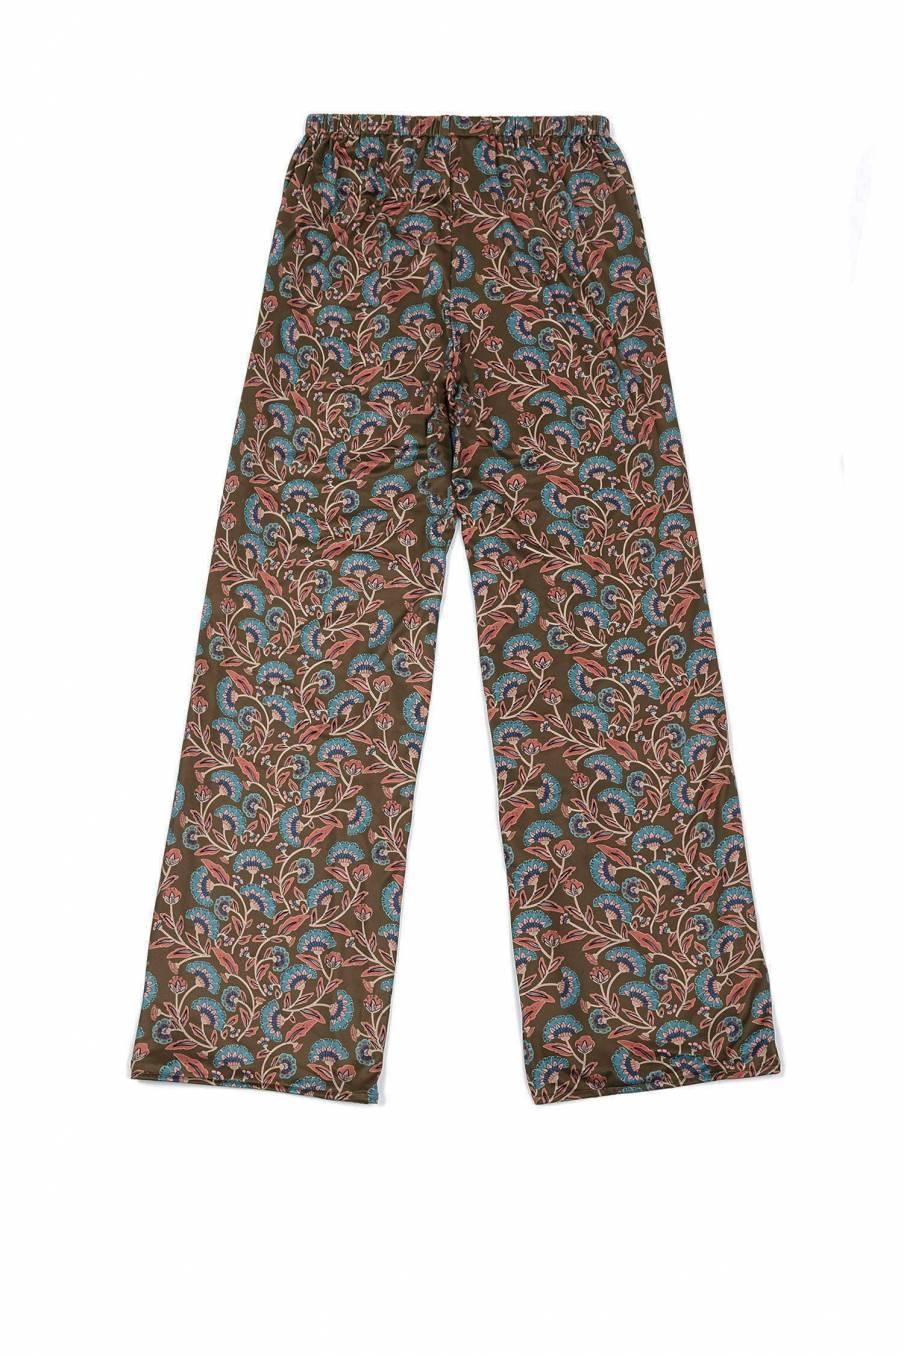 boheme chic vintage bas de pyjama femme melicia bronze folk flowers